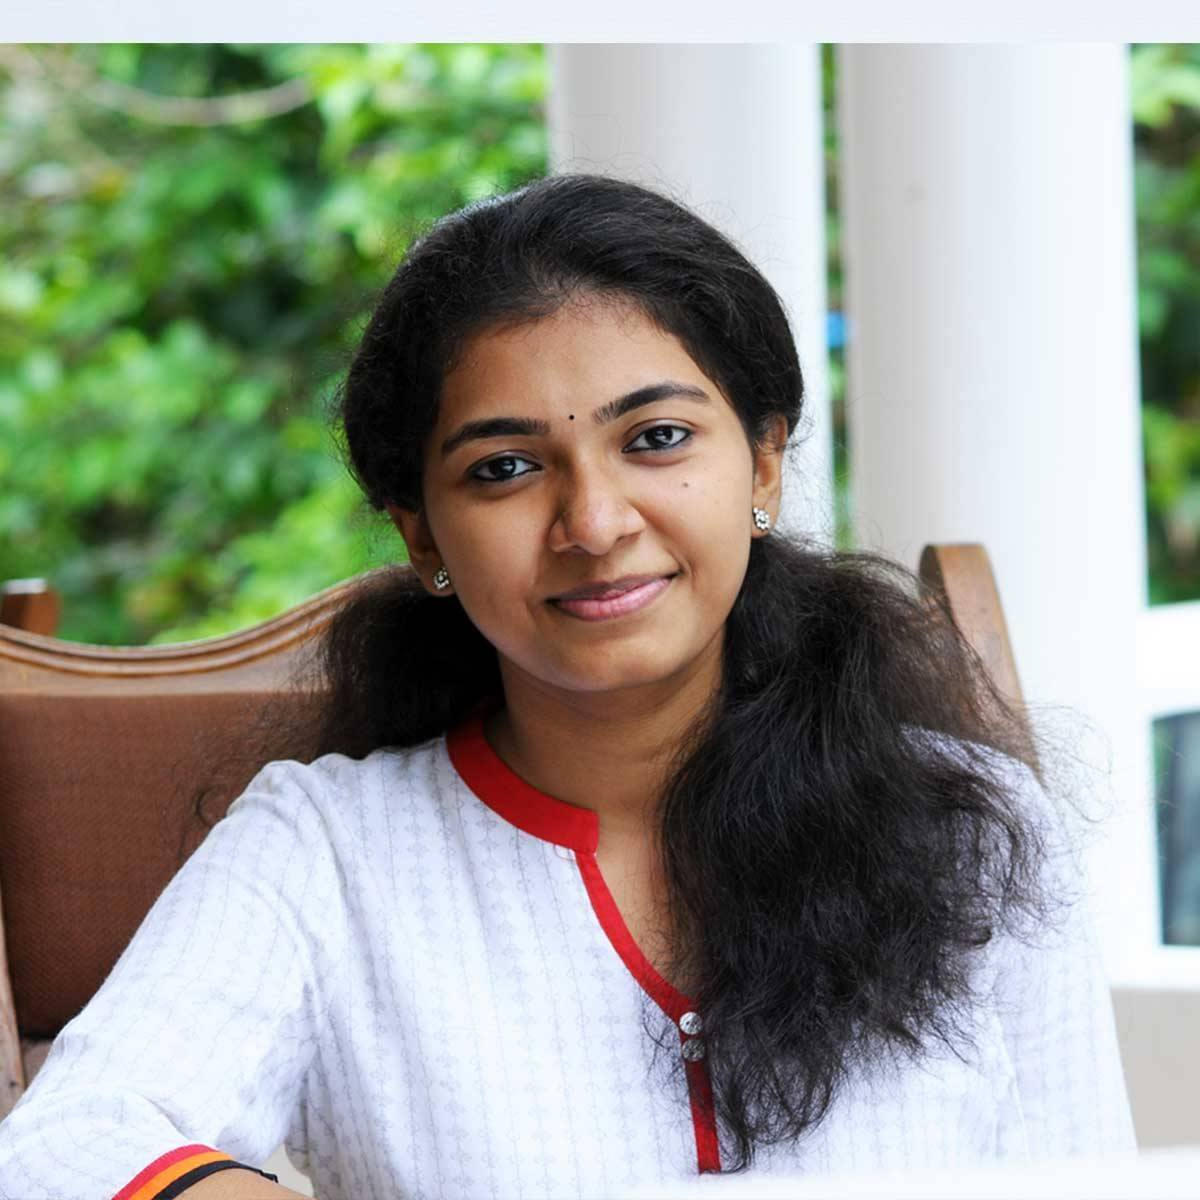 Sreelakshmi Suresh | Top 10 Best Young Indian Entrepreneurs To Look Out in 2021